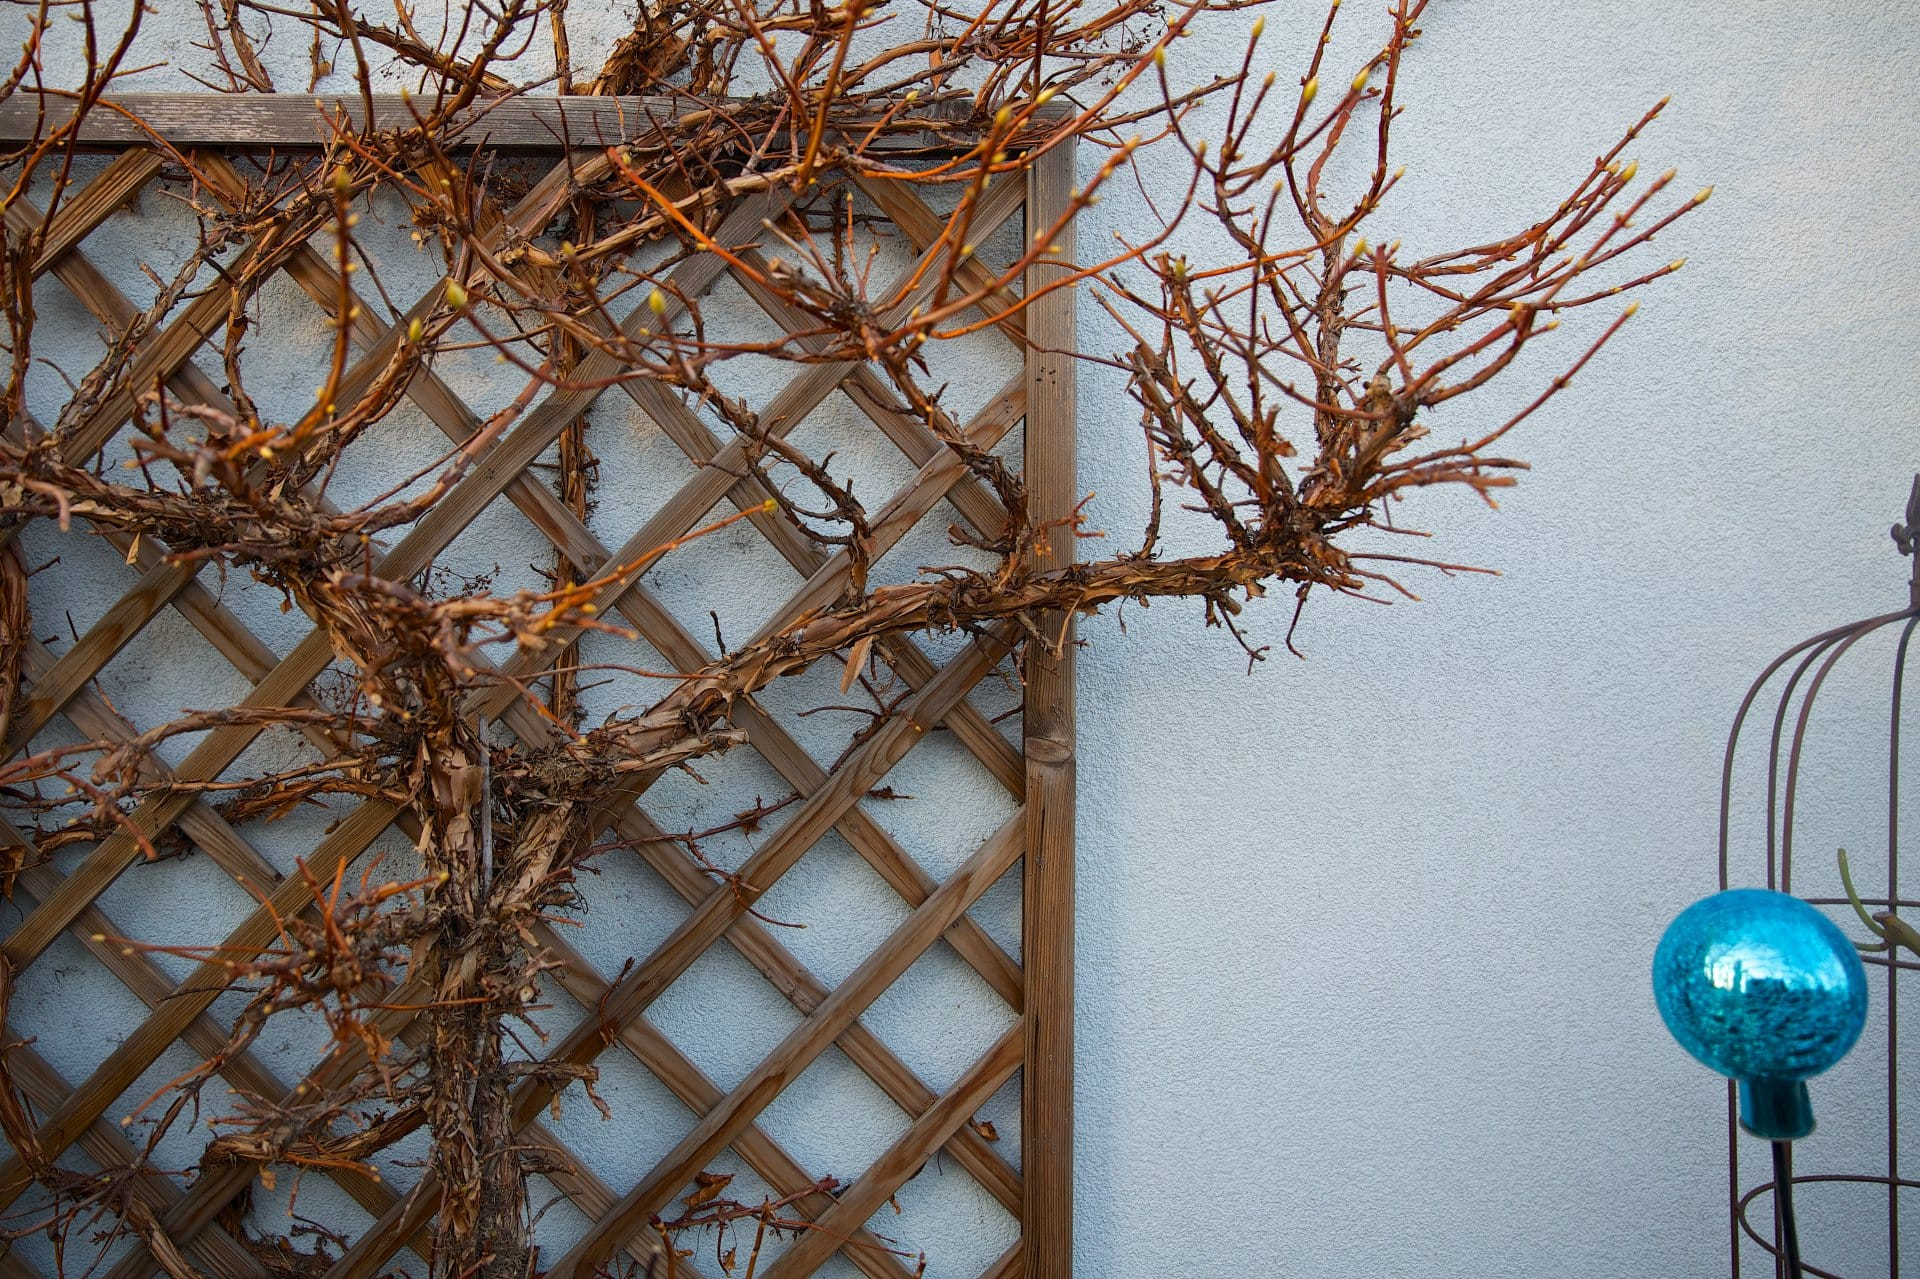 2014 terrasse entwintert 5